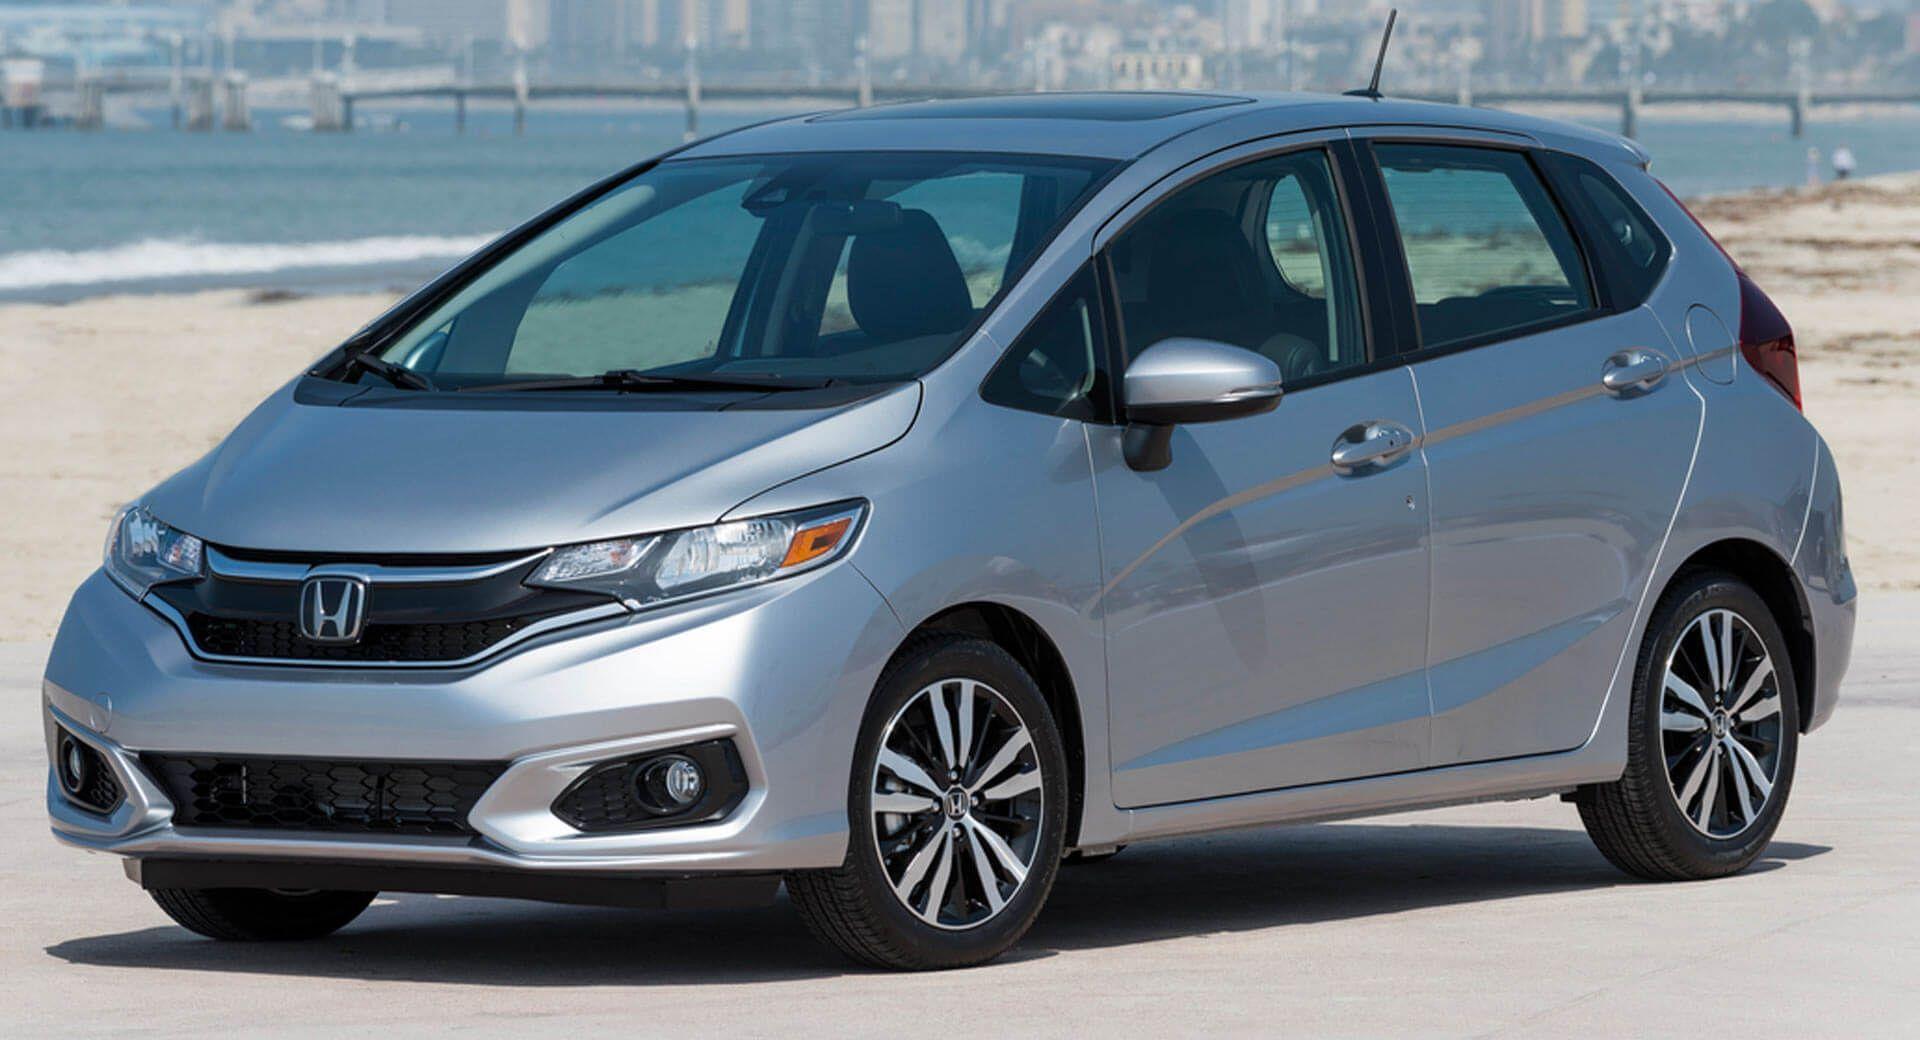 Honda Fit Ev Slated To Make A Return In 2020 Carscoops Honda Fit Honda Jazz New Honda